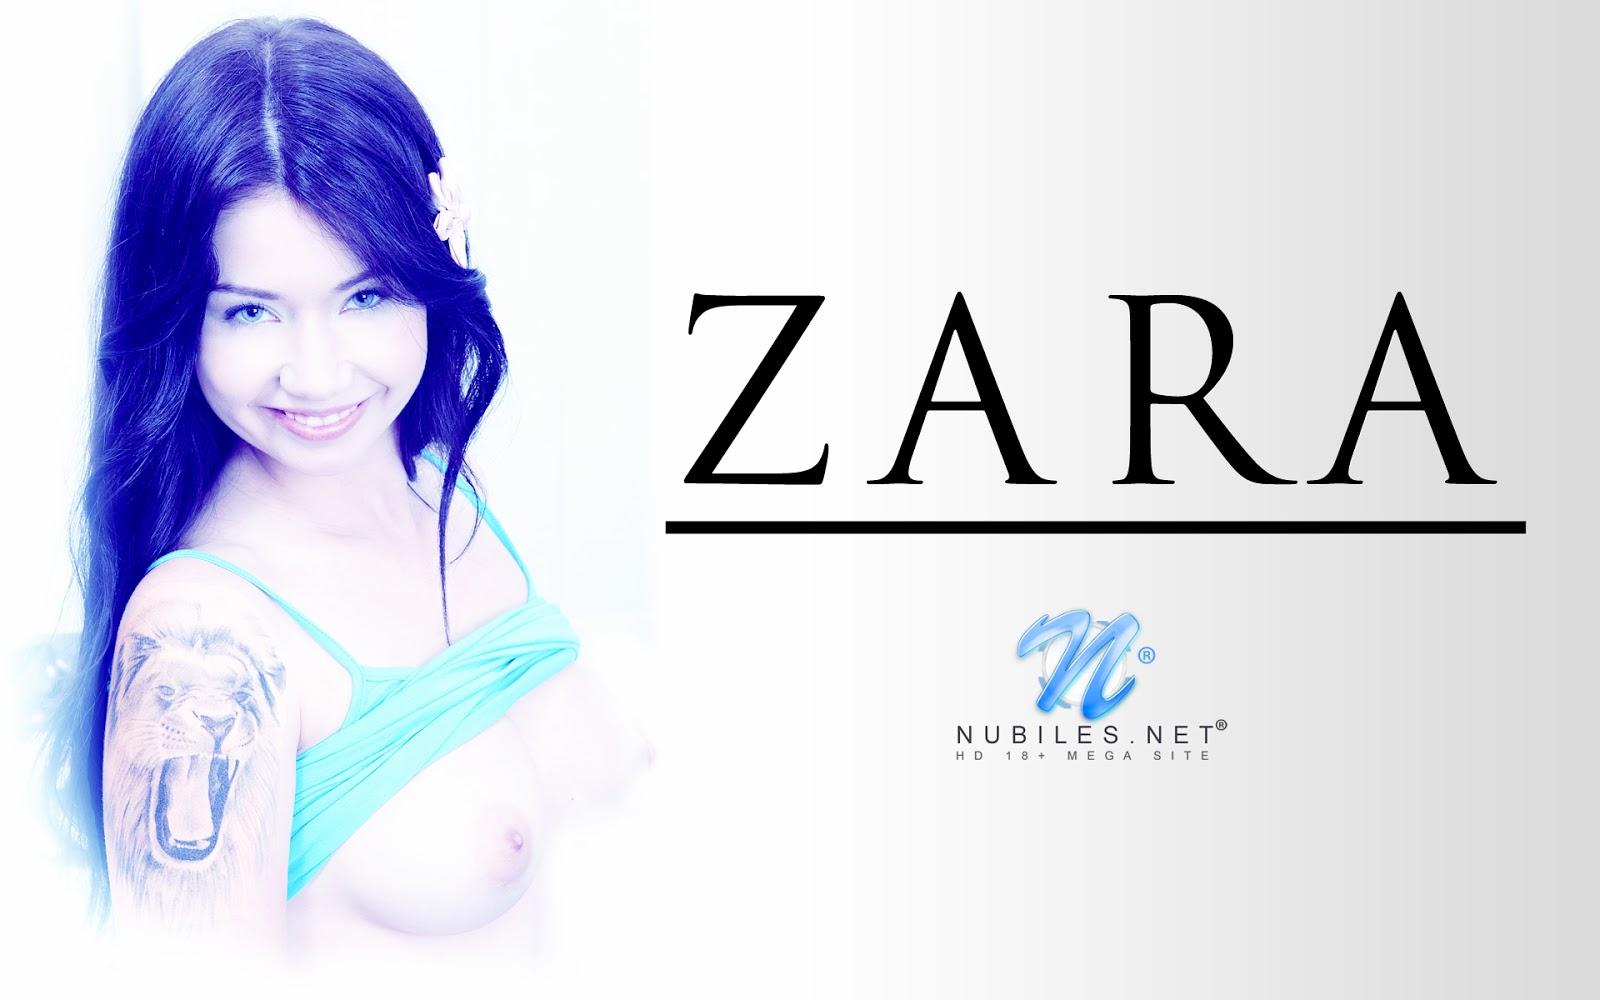 http://3.bp.blogspot.com/-67GlKpeWKyg/UHVW9ZAN1-I/AAAAAAAAAhg/lpeaIBnUmGM/s1600/Zara_wallpaper.jpg